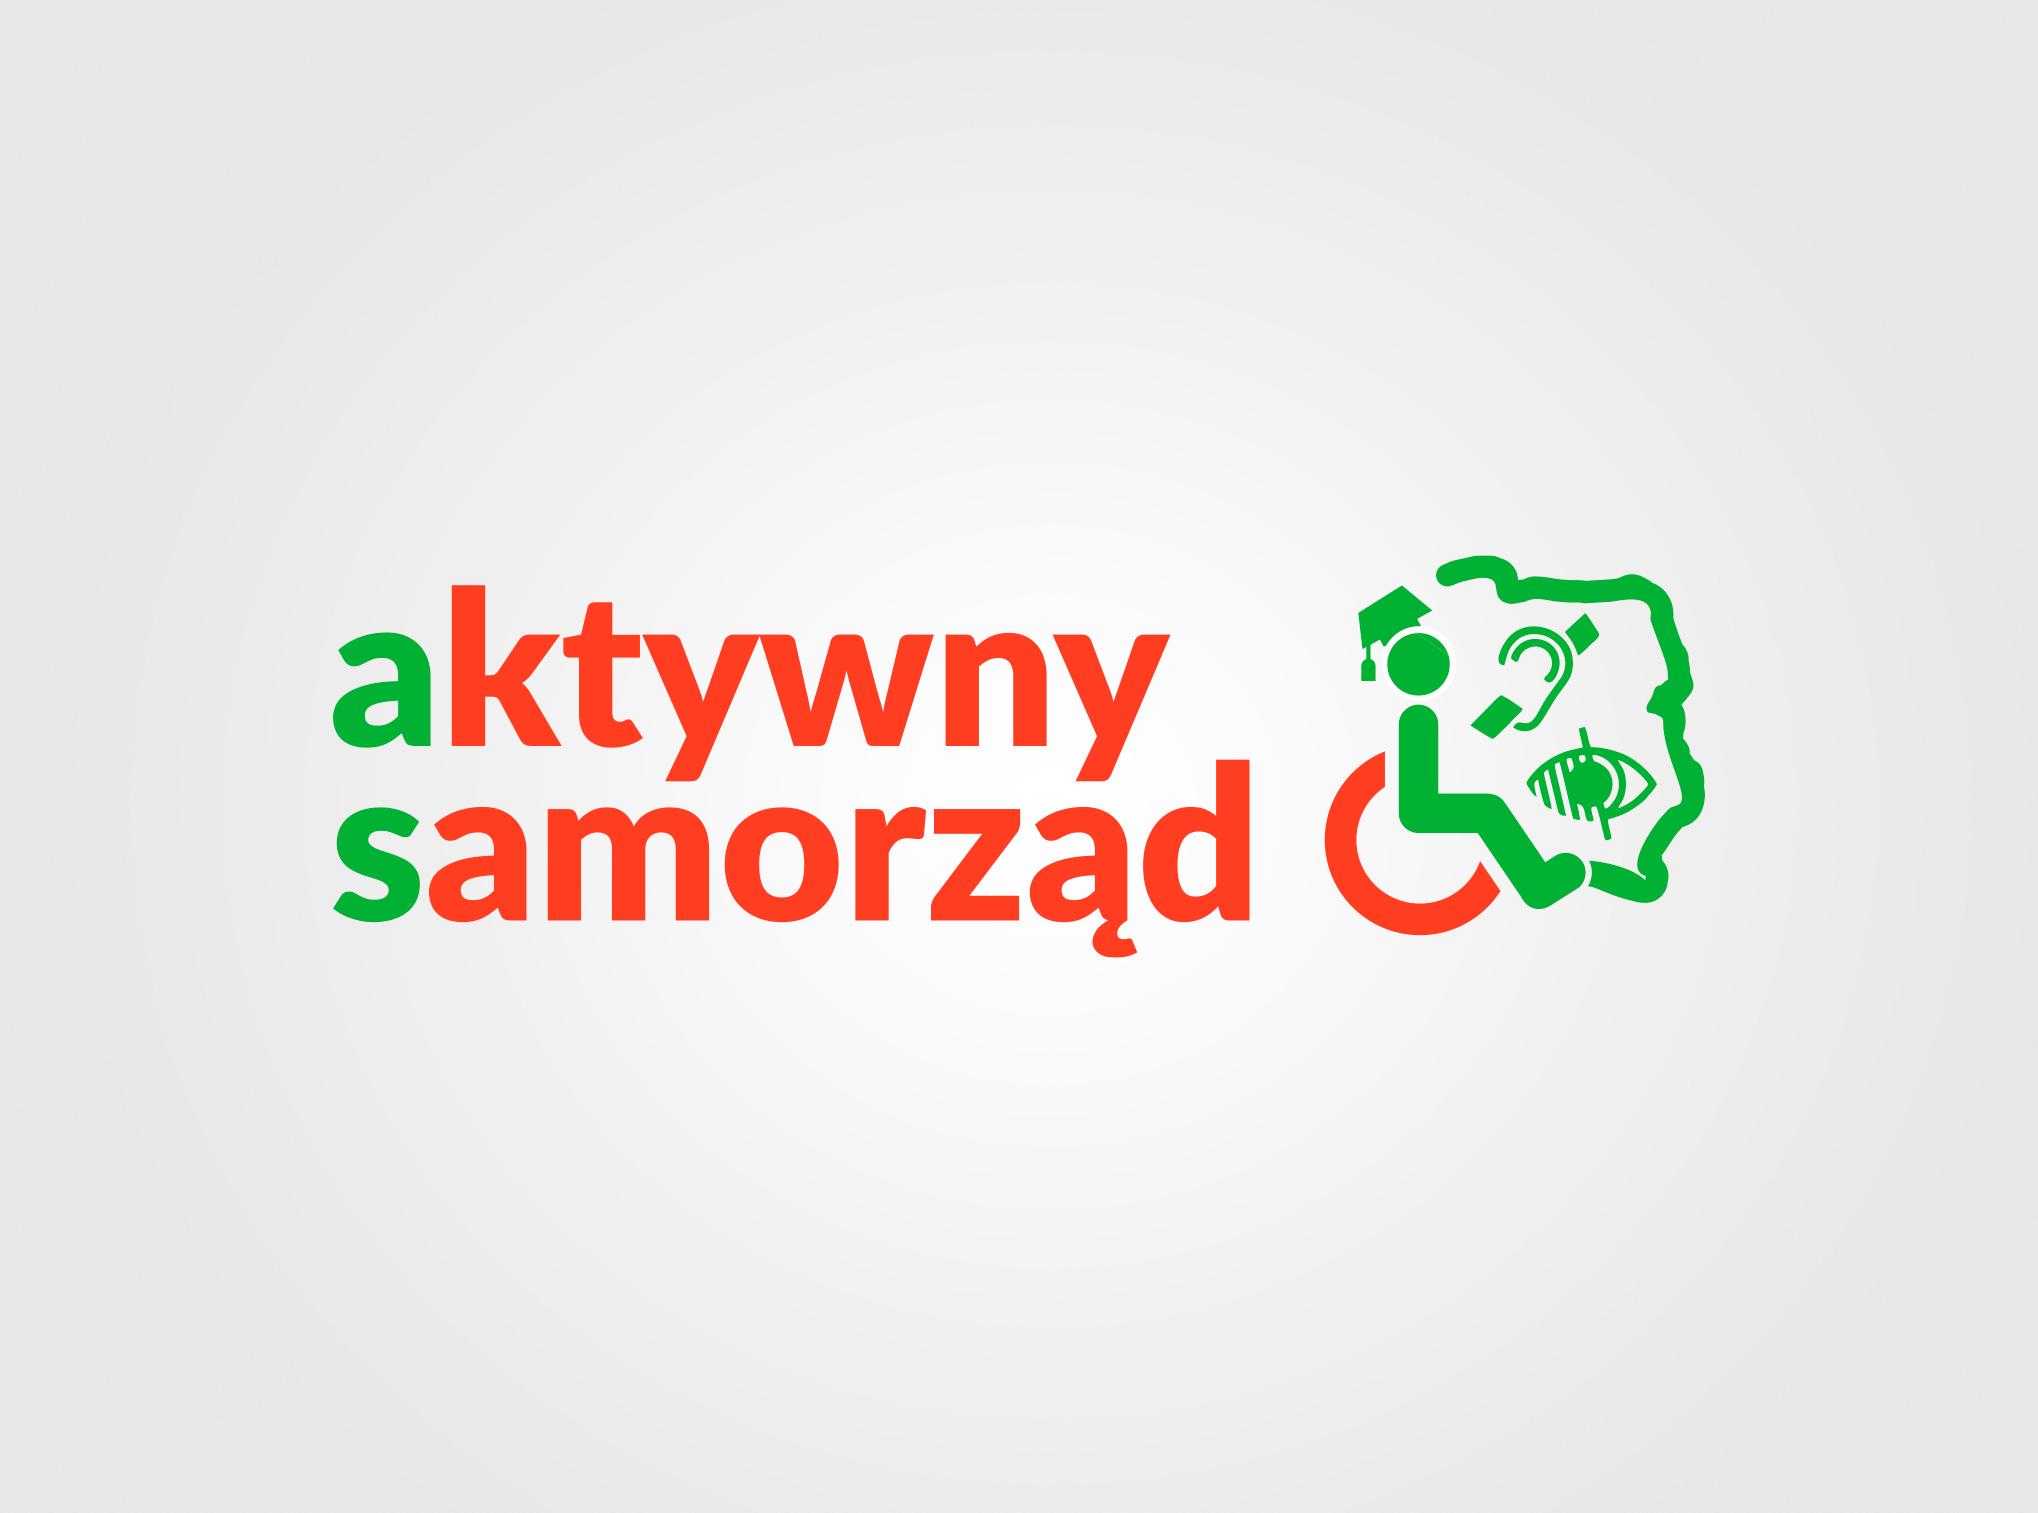 https://www.pfron.org.pl/fileadmin/Programy_PFRON/Aktywny_samorzad/logo_aktywny_s.png